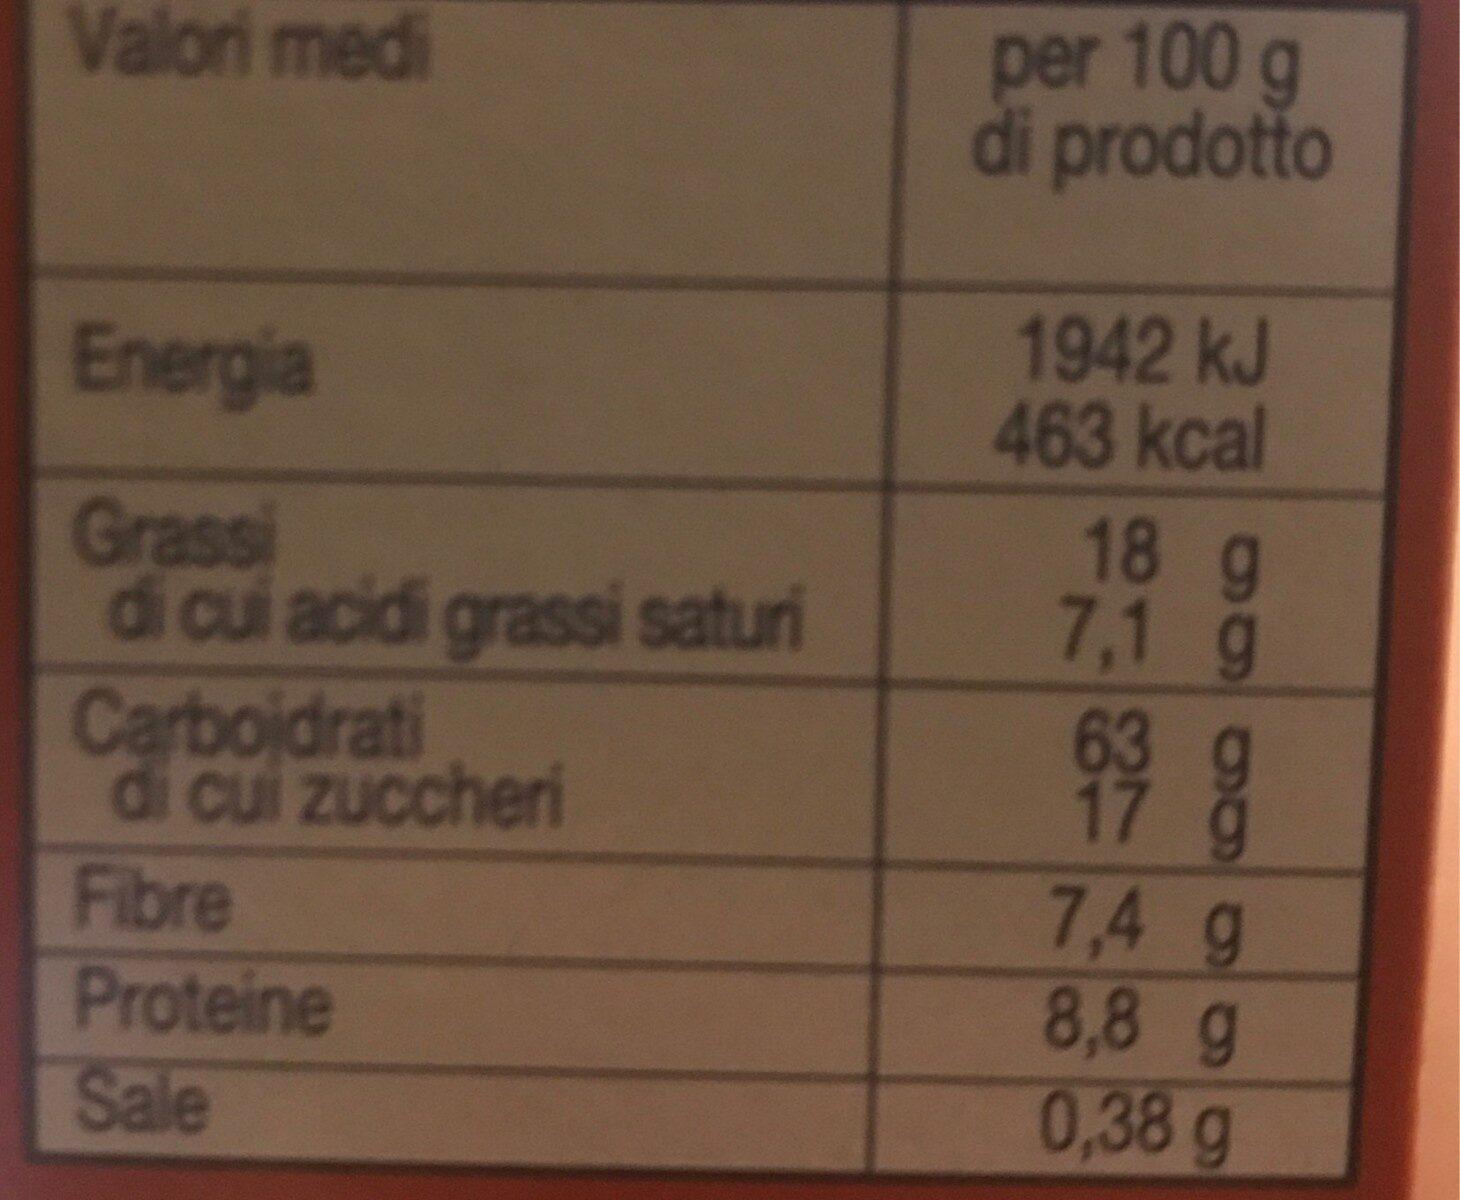 Cereali croccanti - Nutrition facts - it